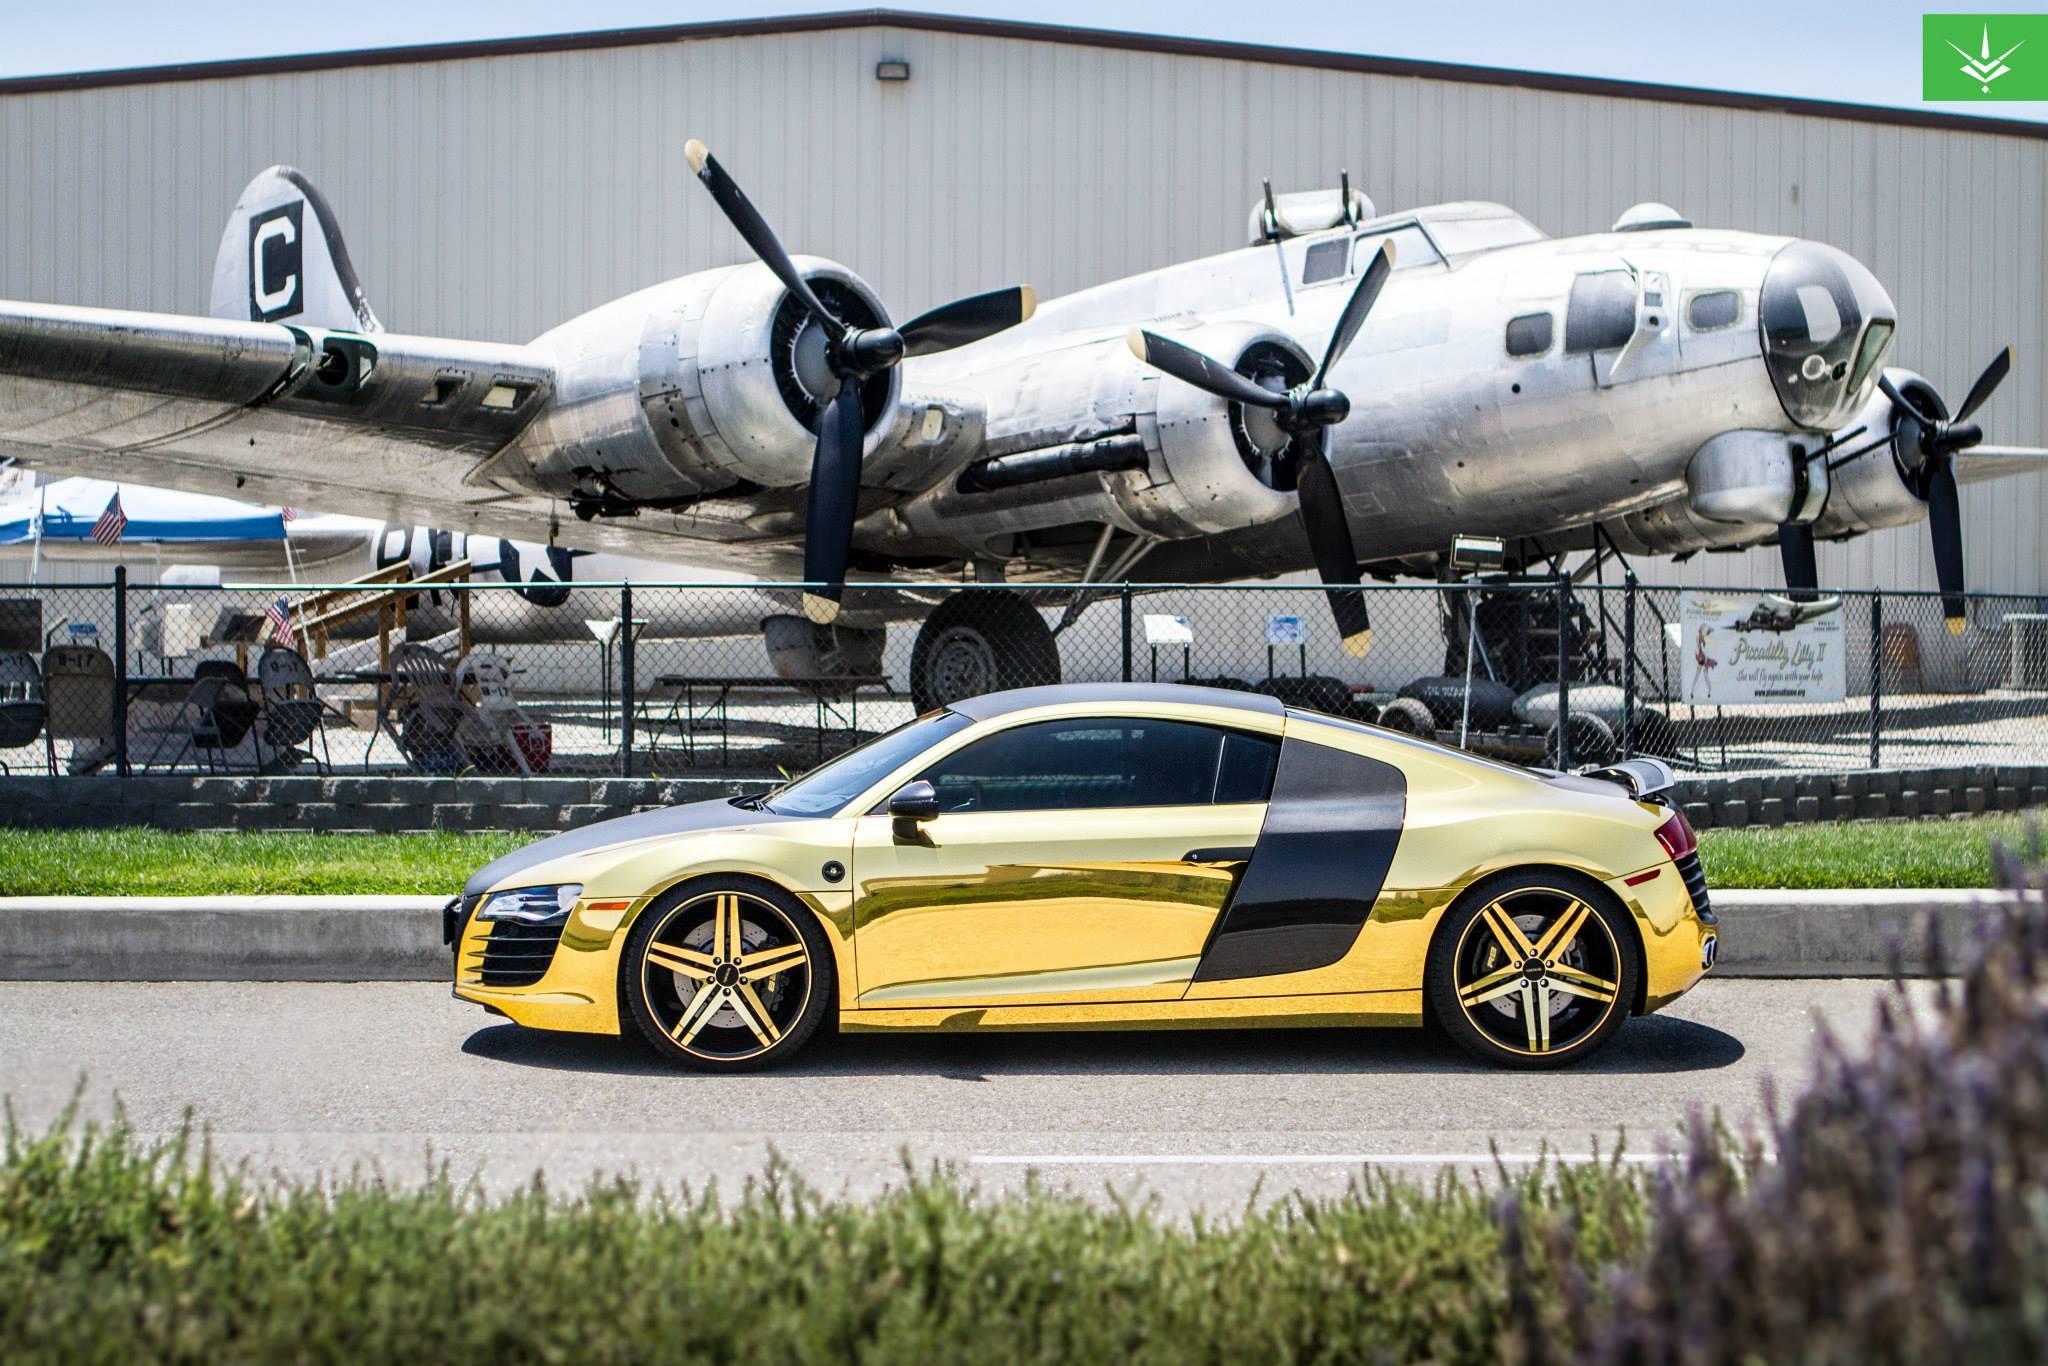 Audi - R8 - 2013 - Wheels & Tires